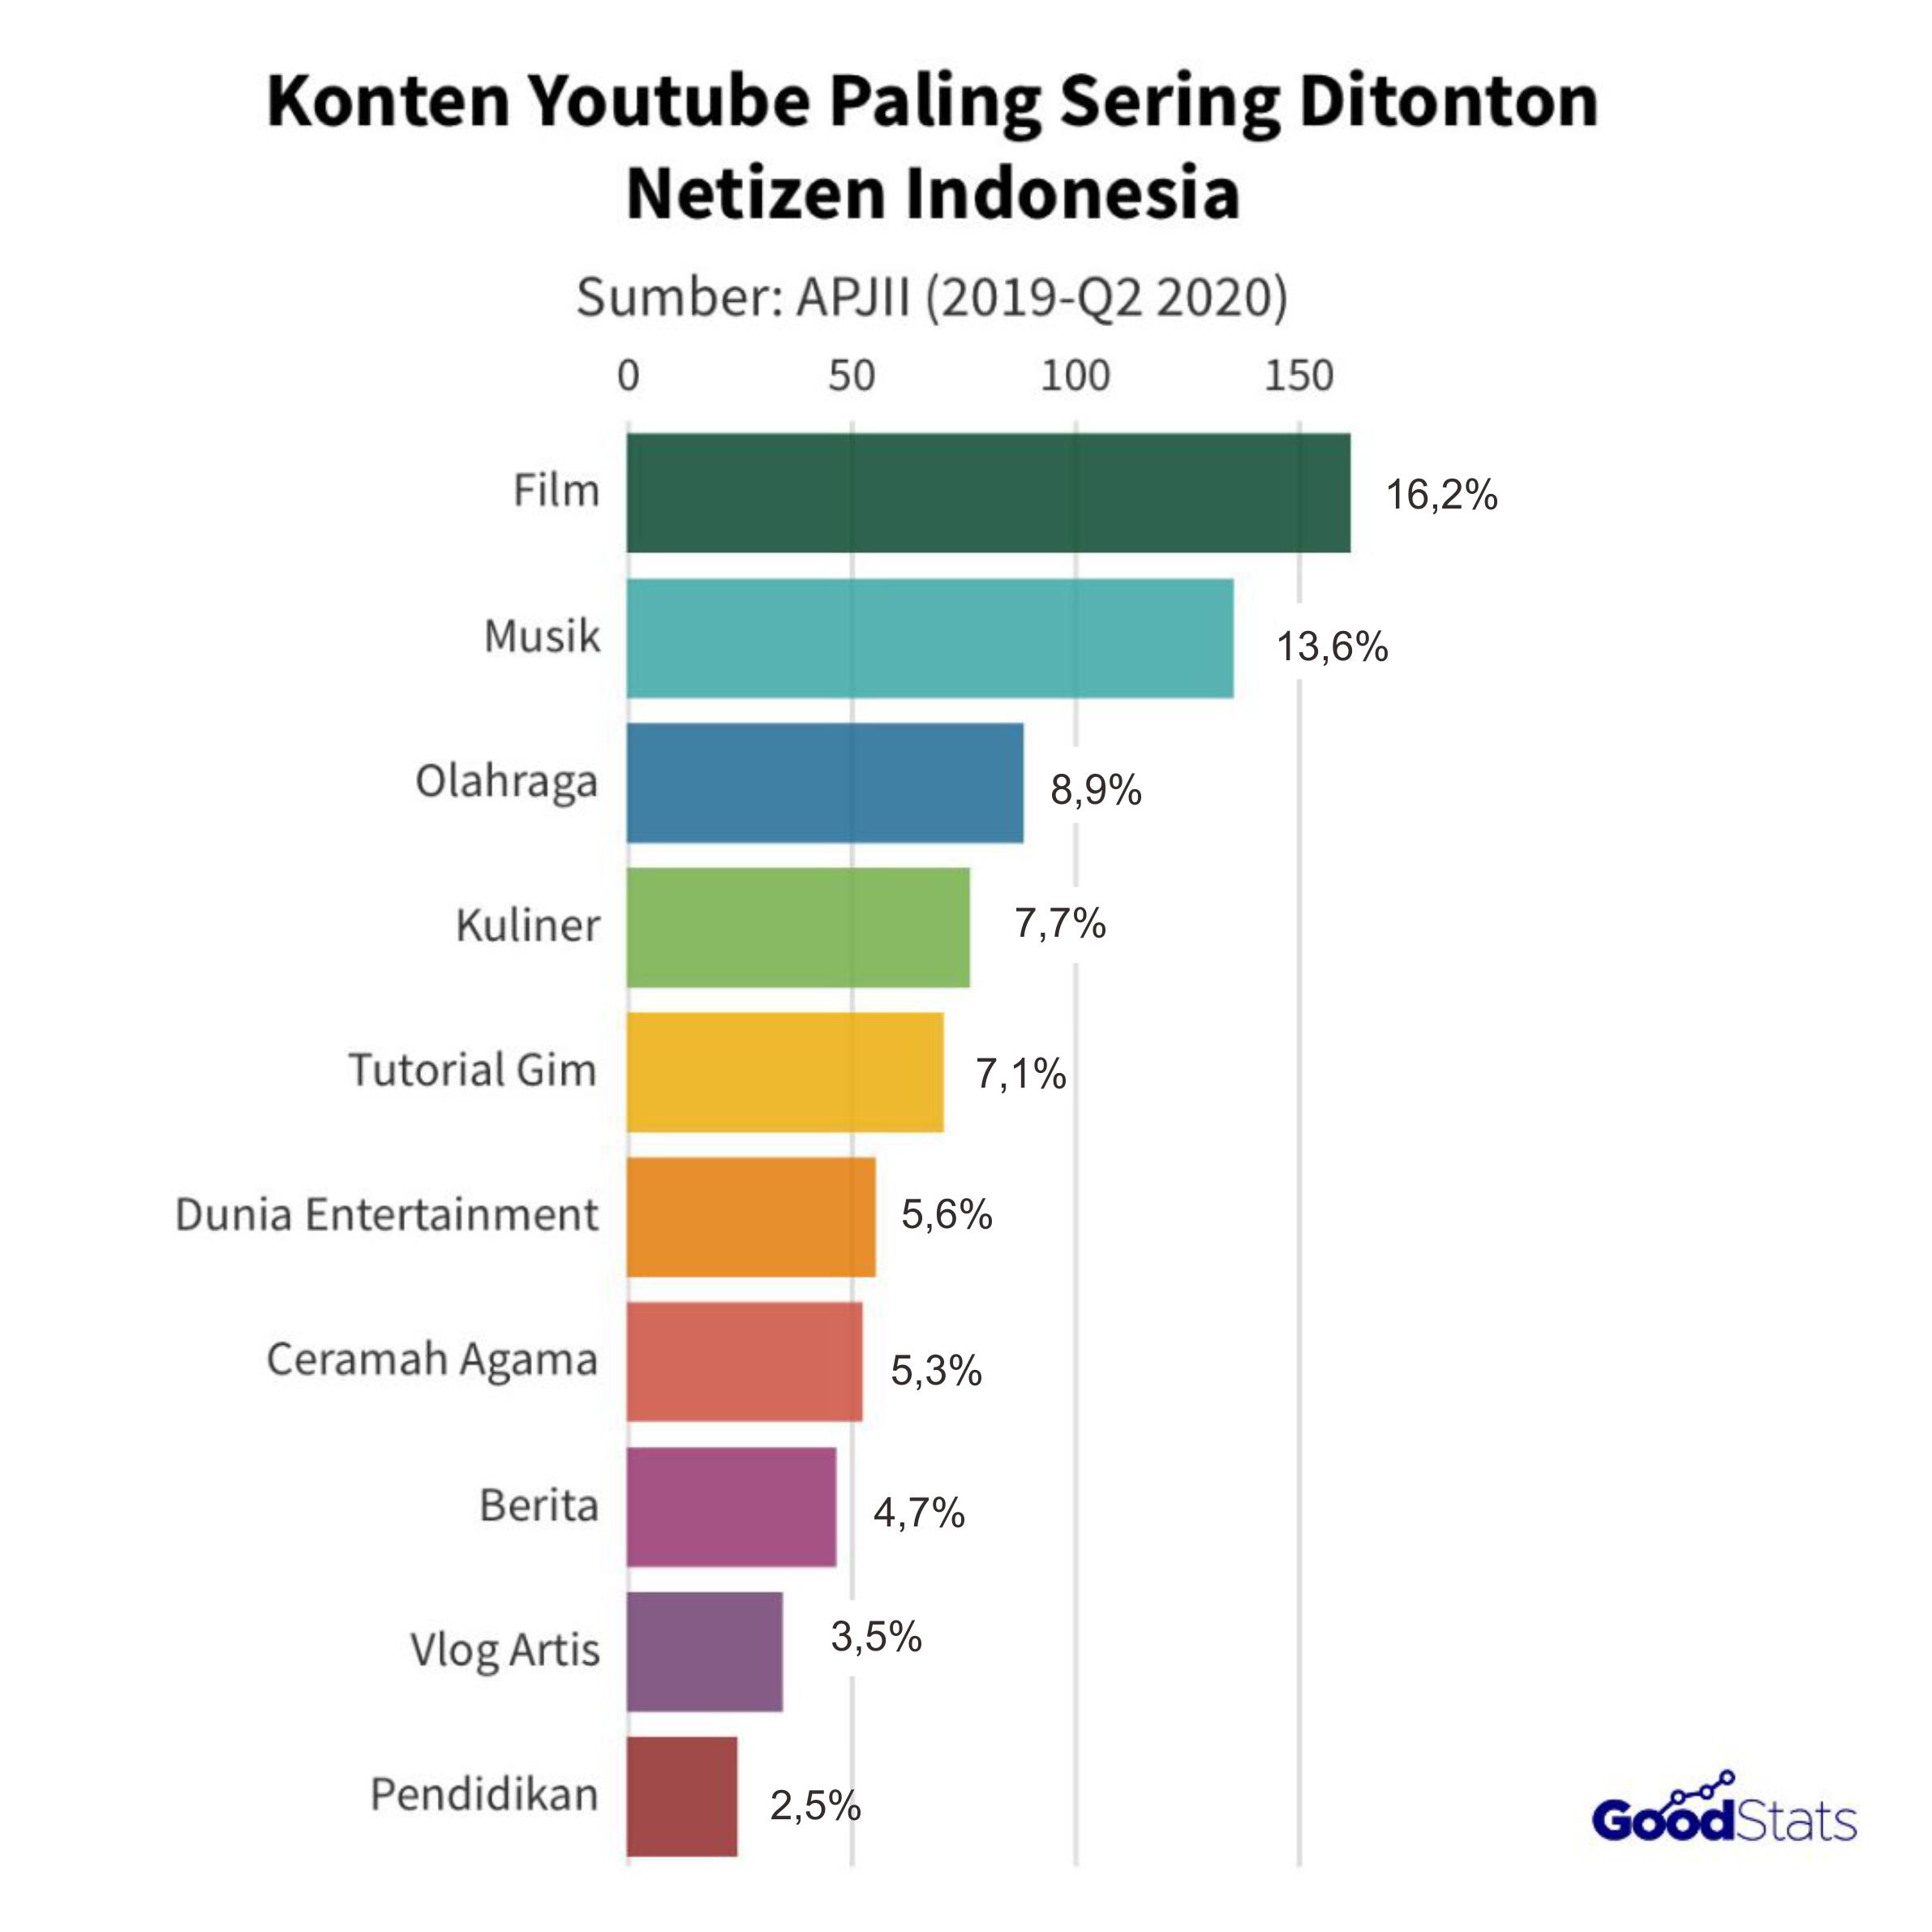 Konten youtube paling banyak ditonton netizen Indonesia   GoodStats